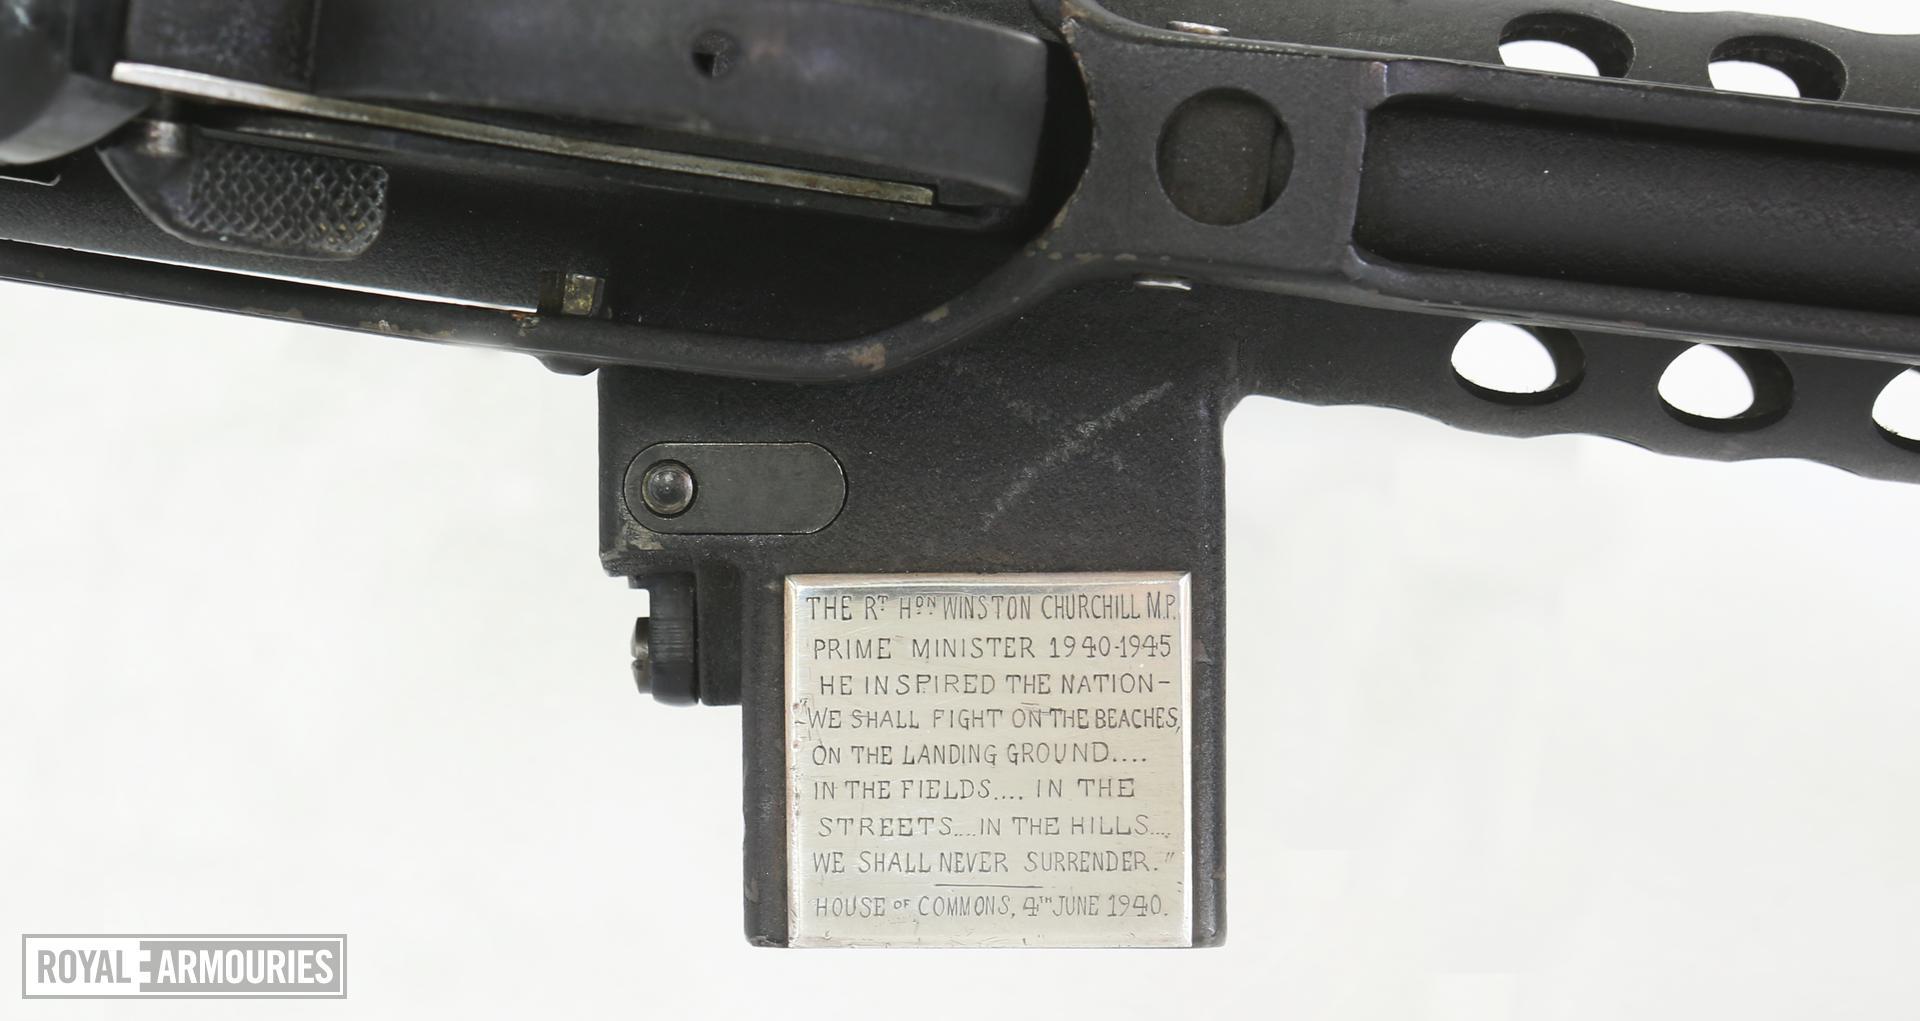 Centrefire automatic submachine gun - Patchett Mk.II presentation type